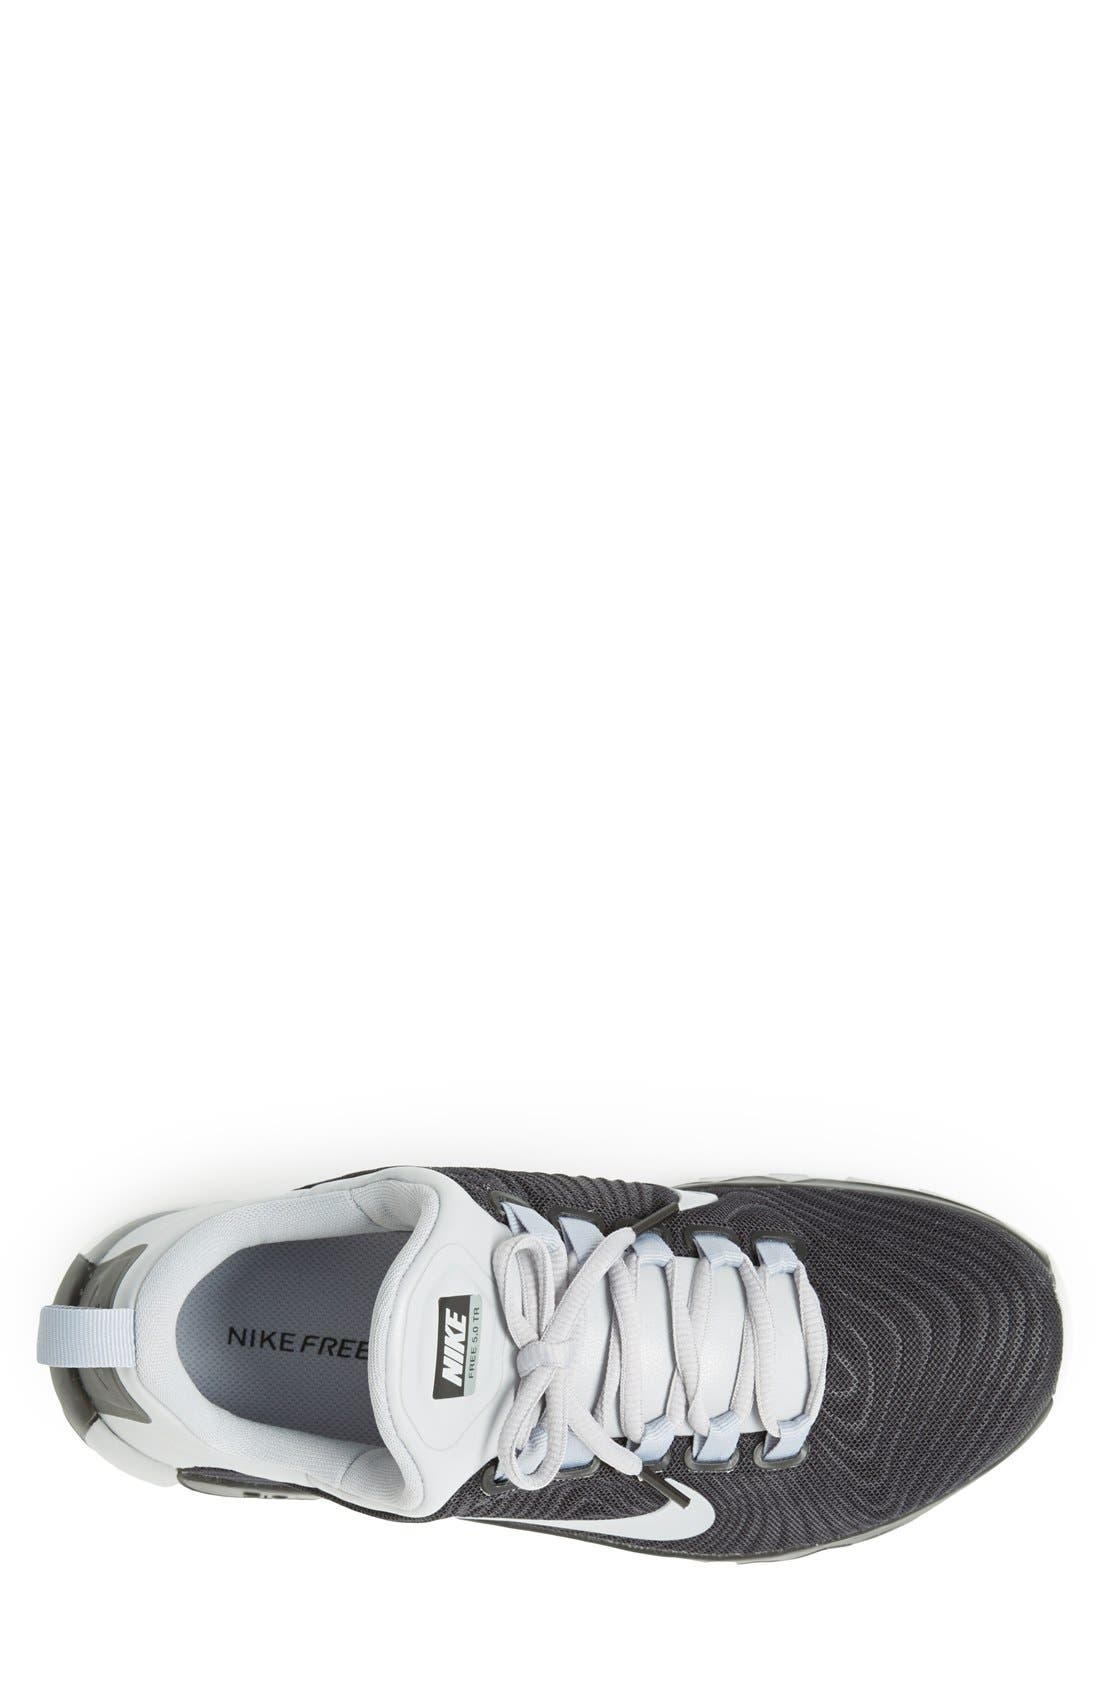 Alternate Image 2  - Nike 'Free 5.0 Trainer' Training Shoe (Men)